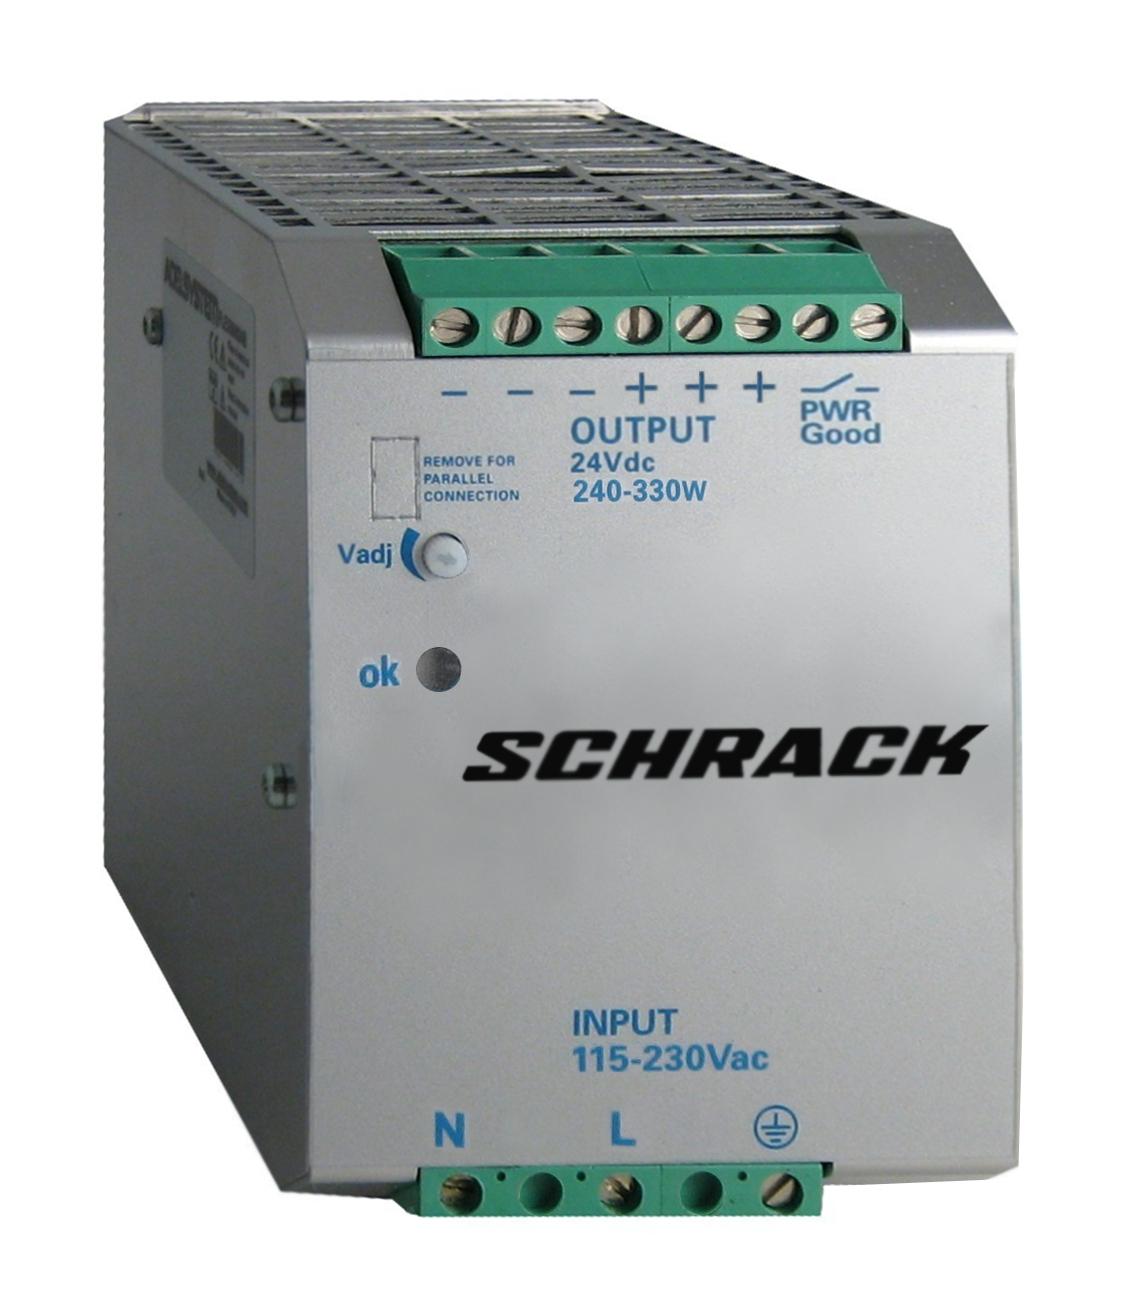 1 Stk Einphasiges Netzgerät getaktet, 230VAC/24VDC, 12A bei 50°C LP412412--